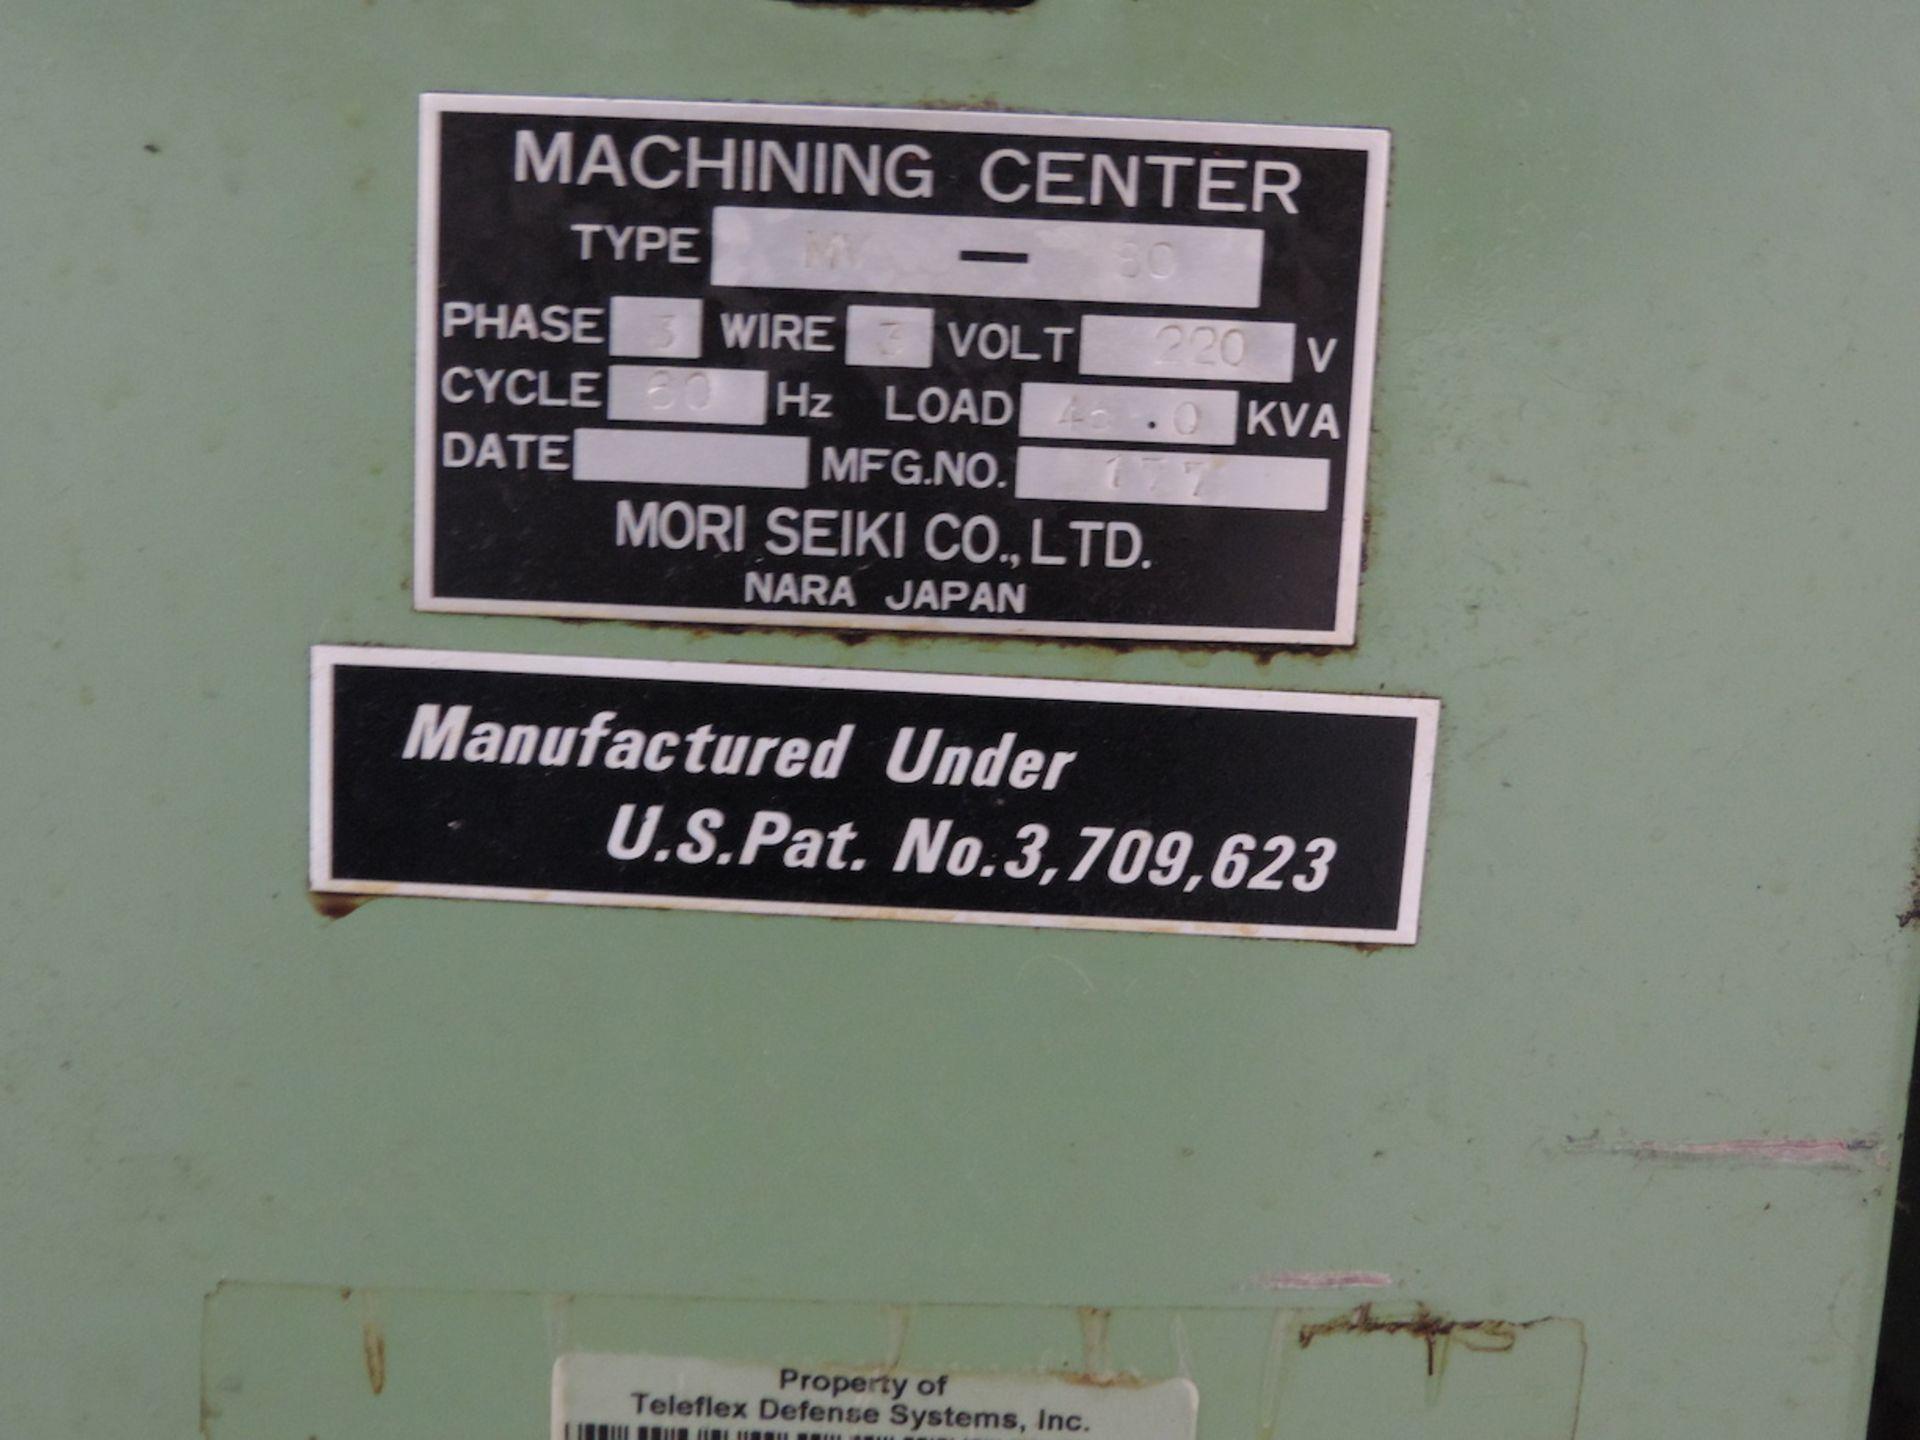 "MORI SEIKI MV-80 VMC, YASNAC MX-1 CONTROL, XYZ TRAVELS: 60"" X 31"" X 29"", 74"" X 32"" TABLE, 50 SPINDLE - Image 12 of 13"